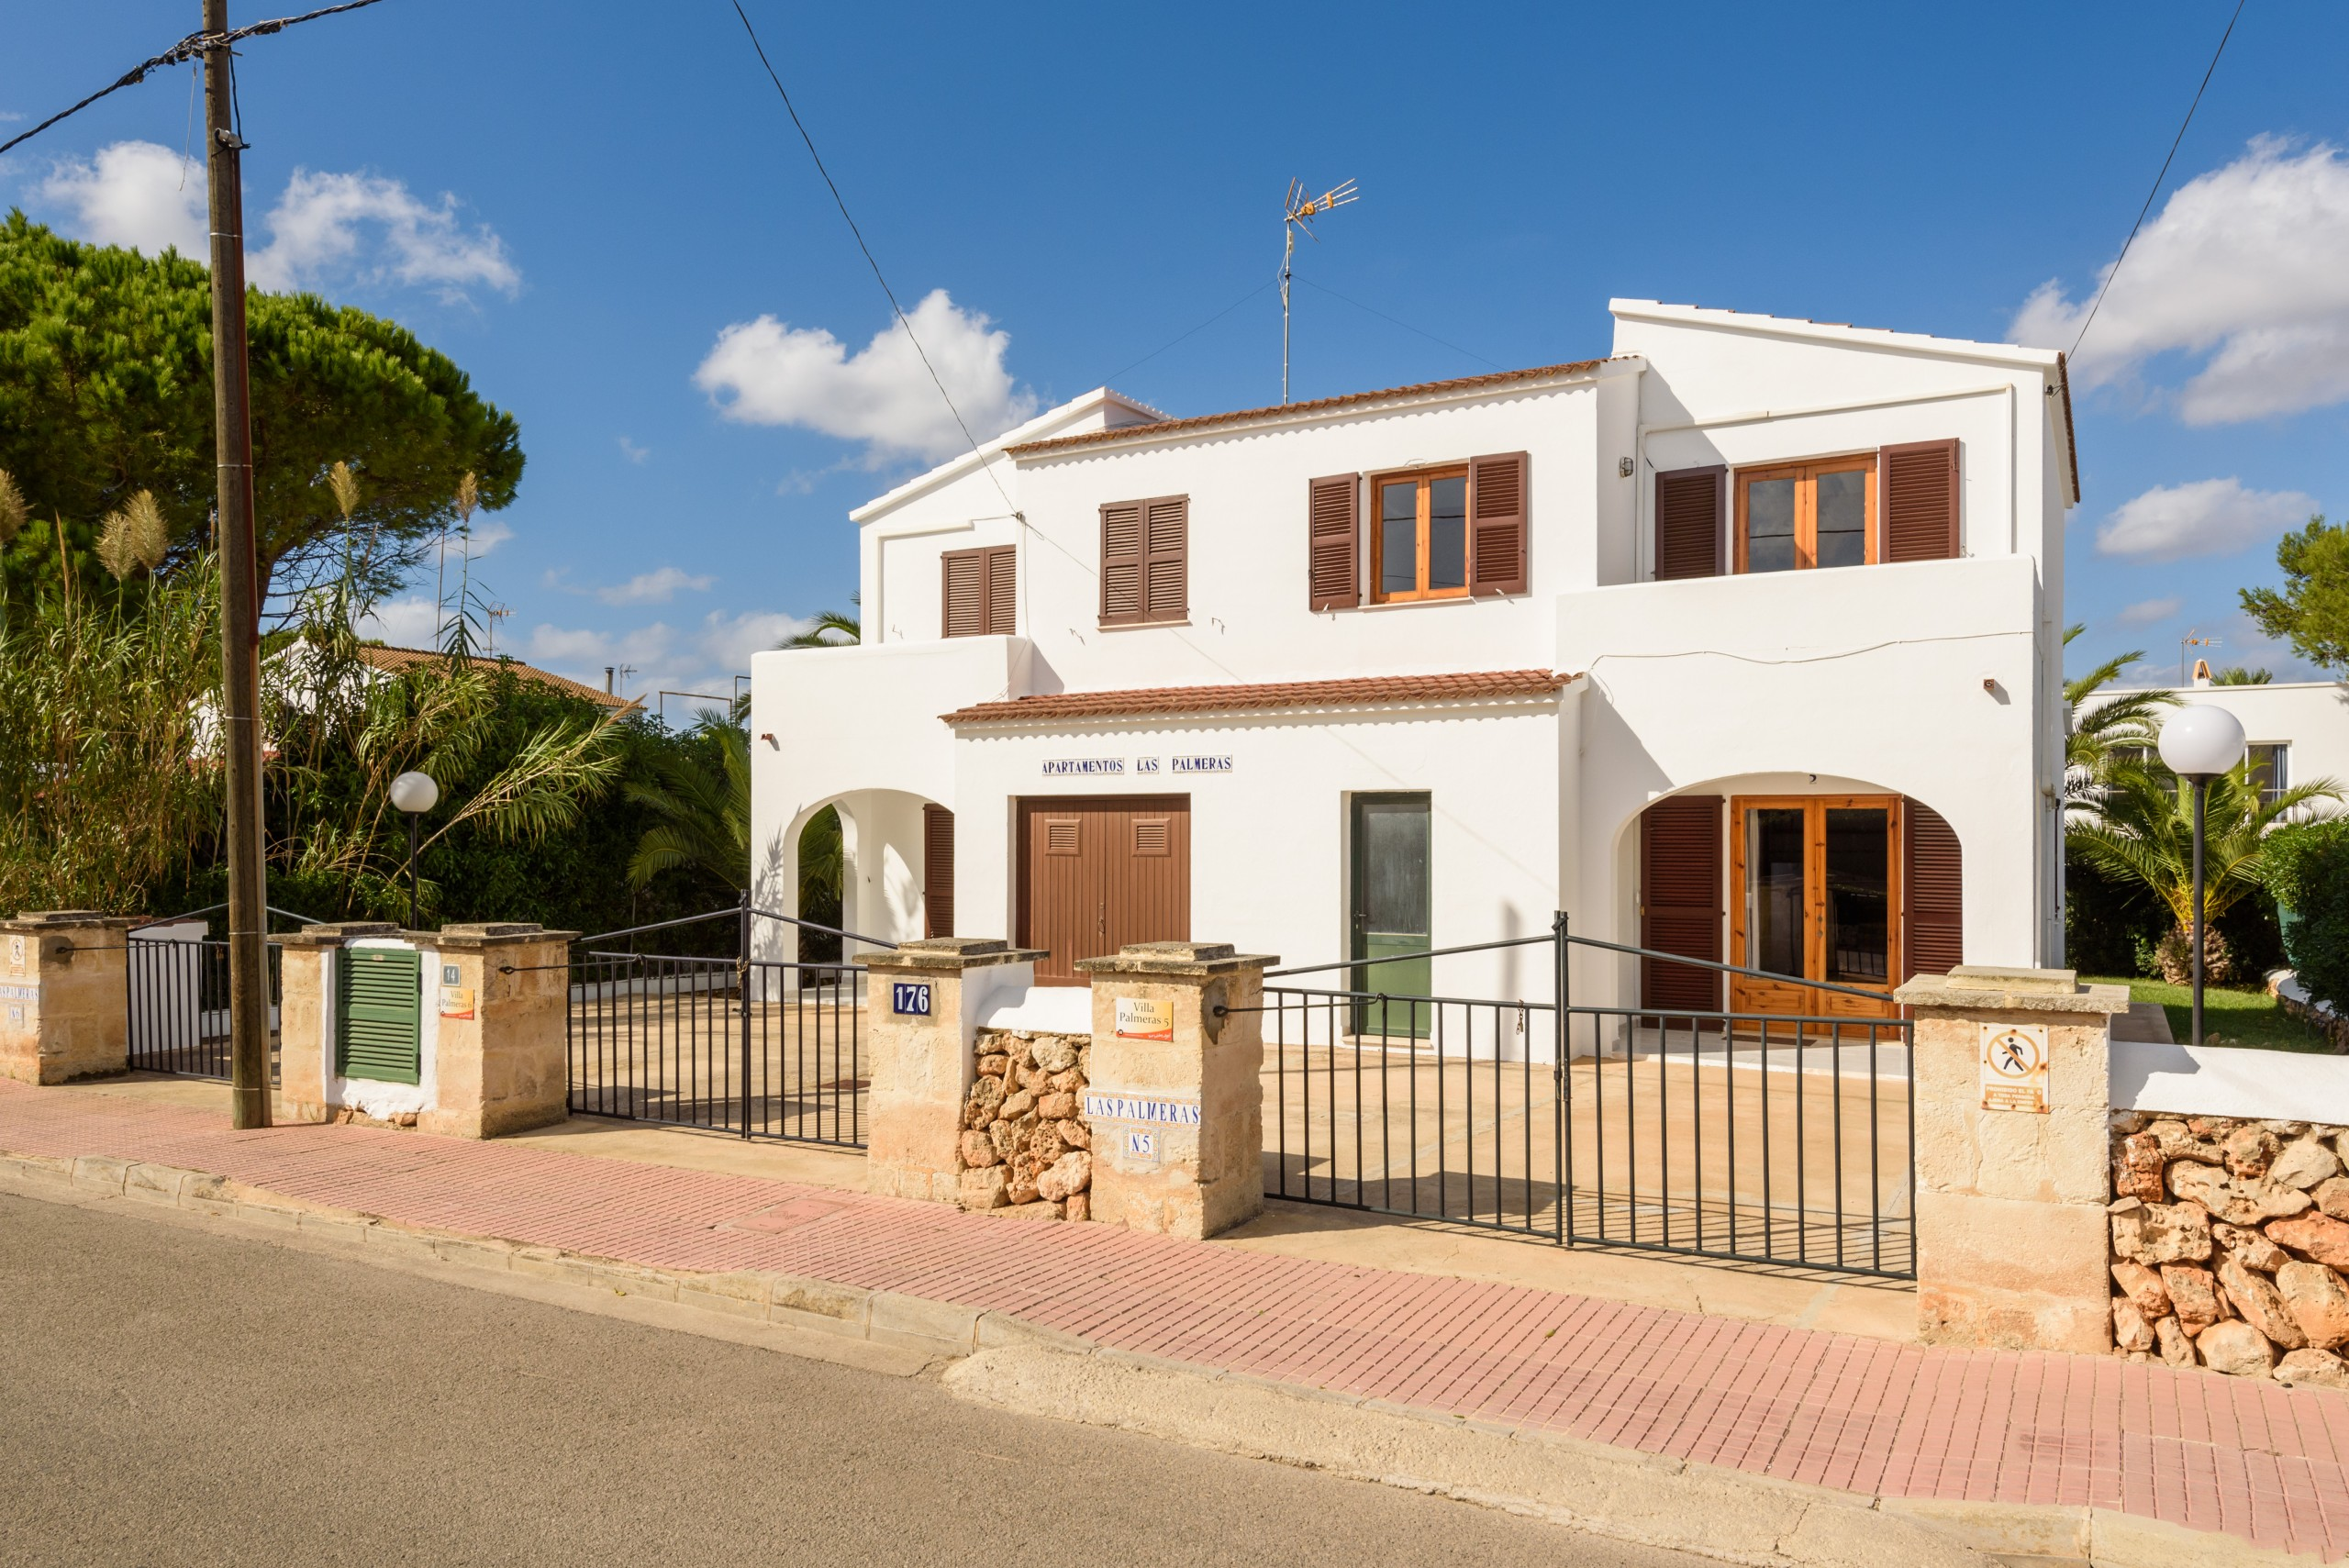 Menorca Apartments - Apartments in Menorca / Mauter Villas ...